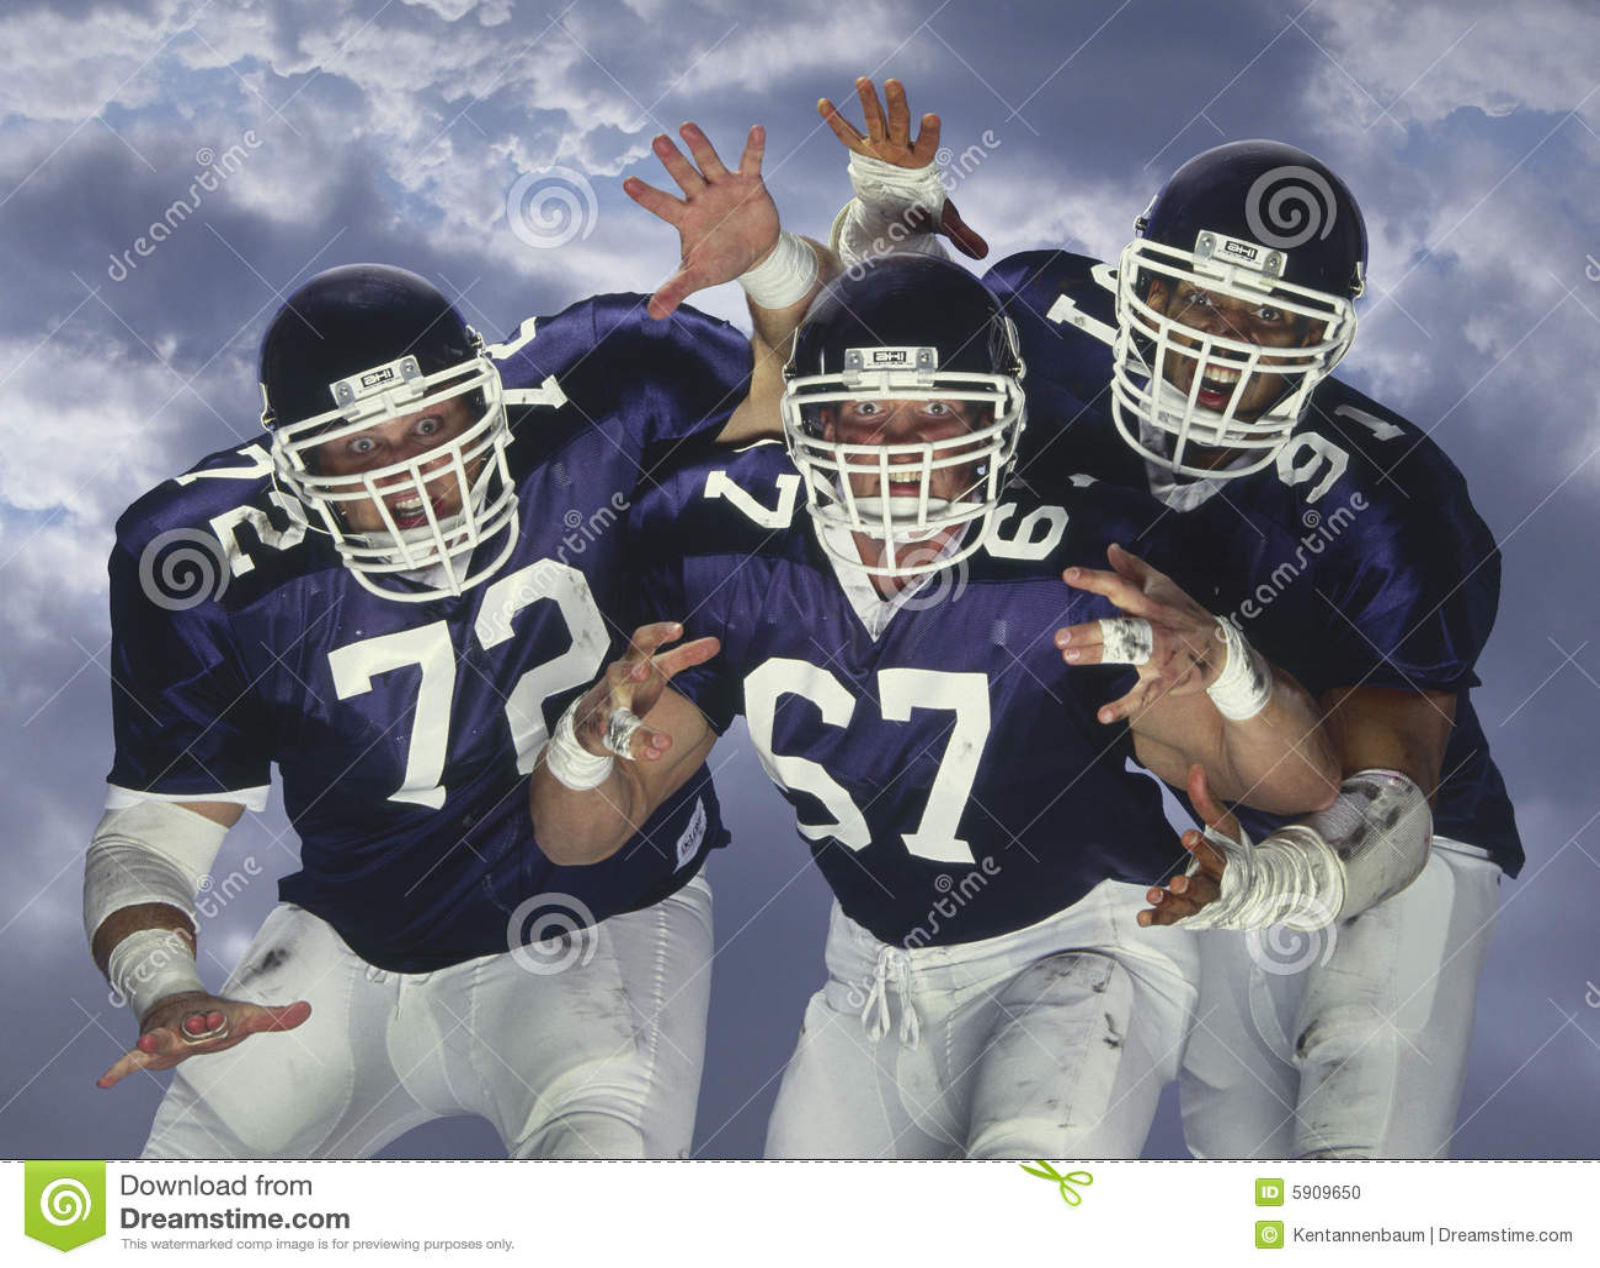 American football linesmen